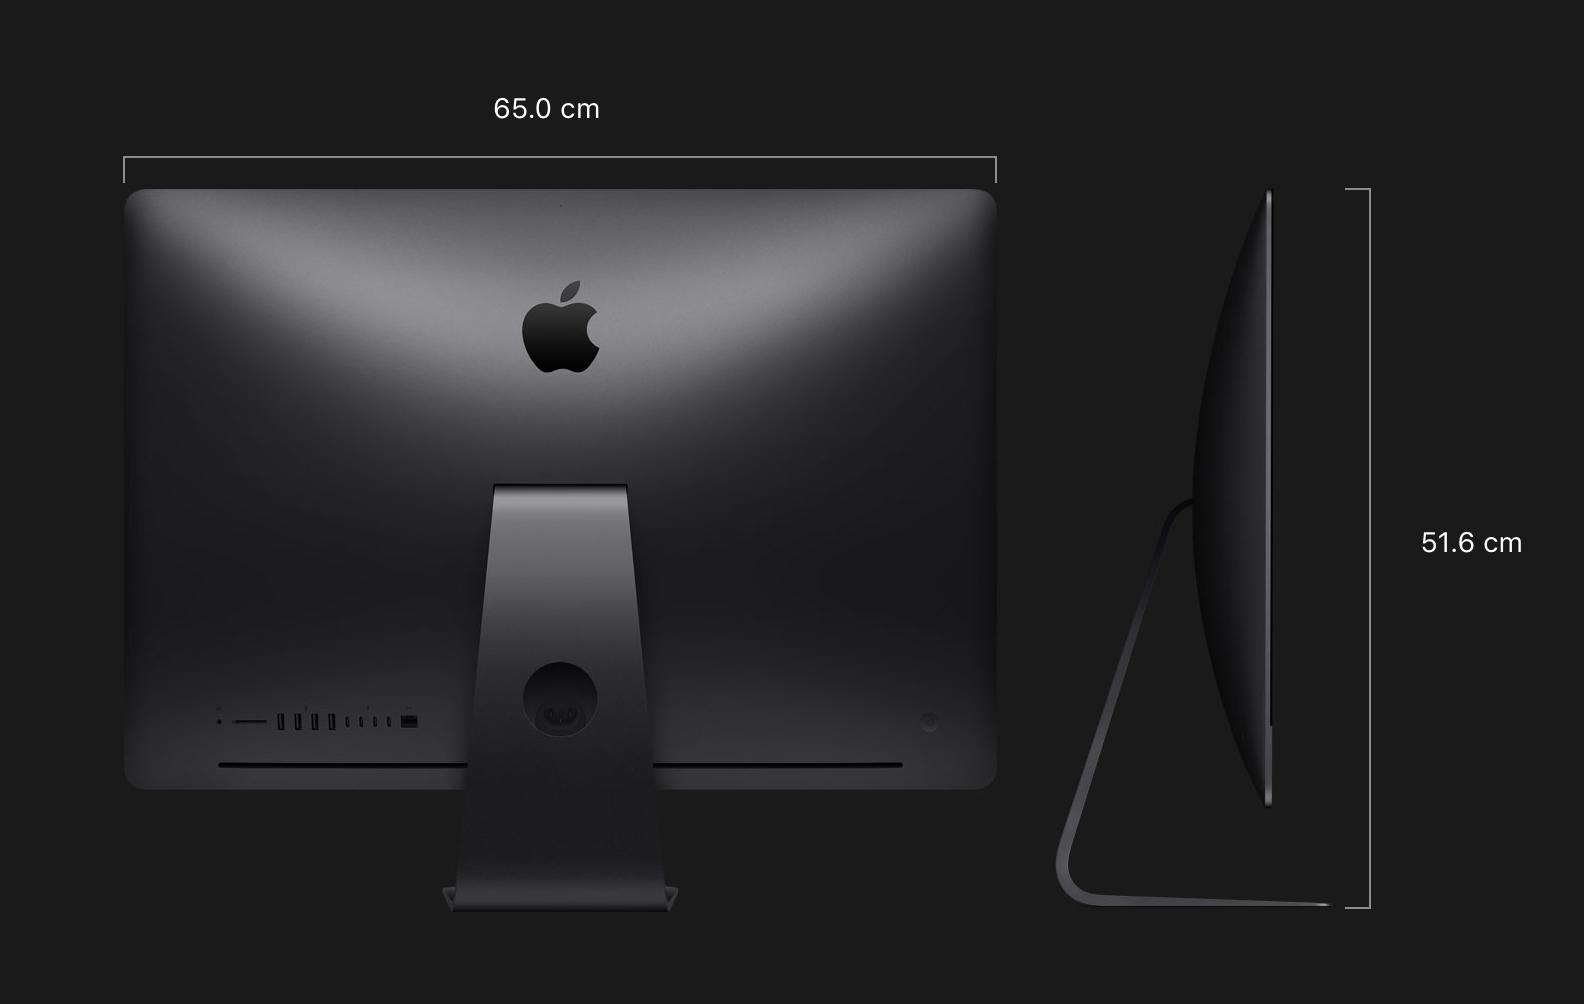 iMac Proサイズと重量の写真